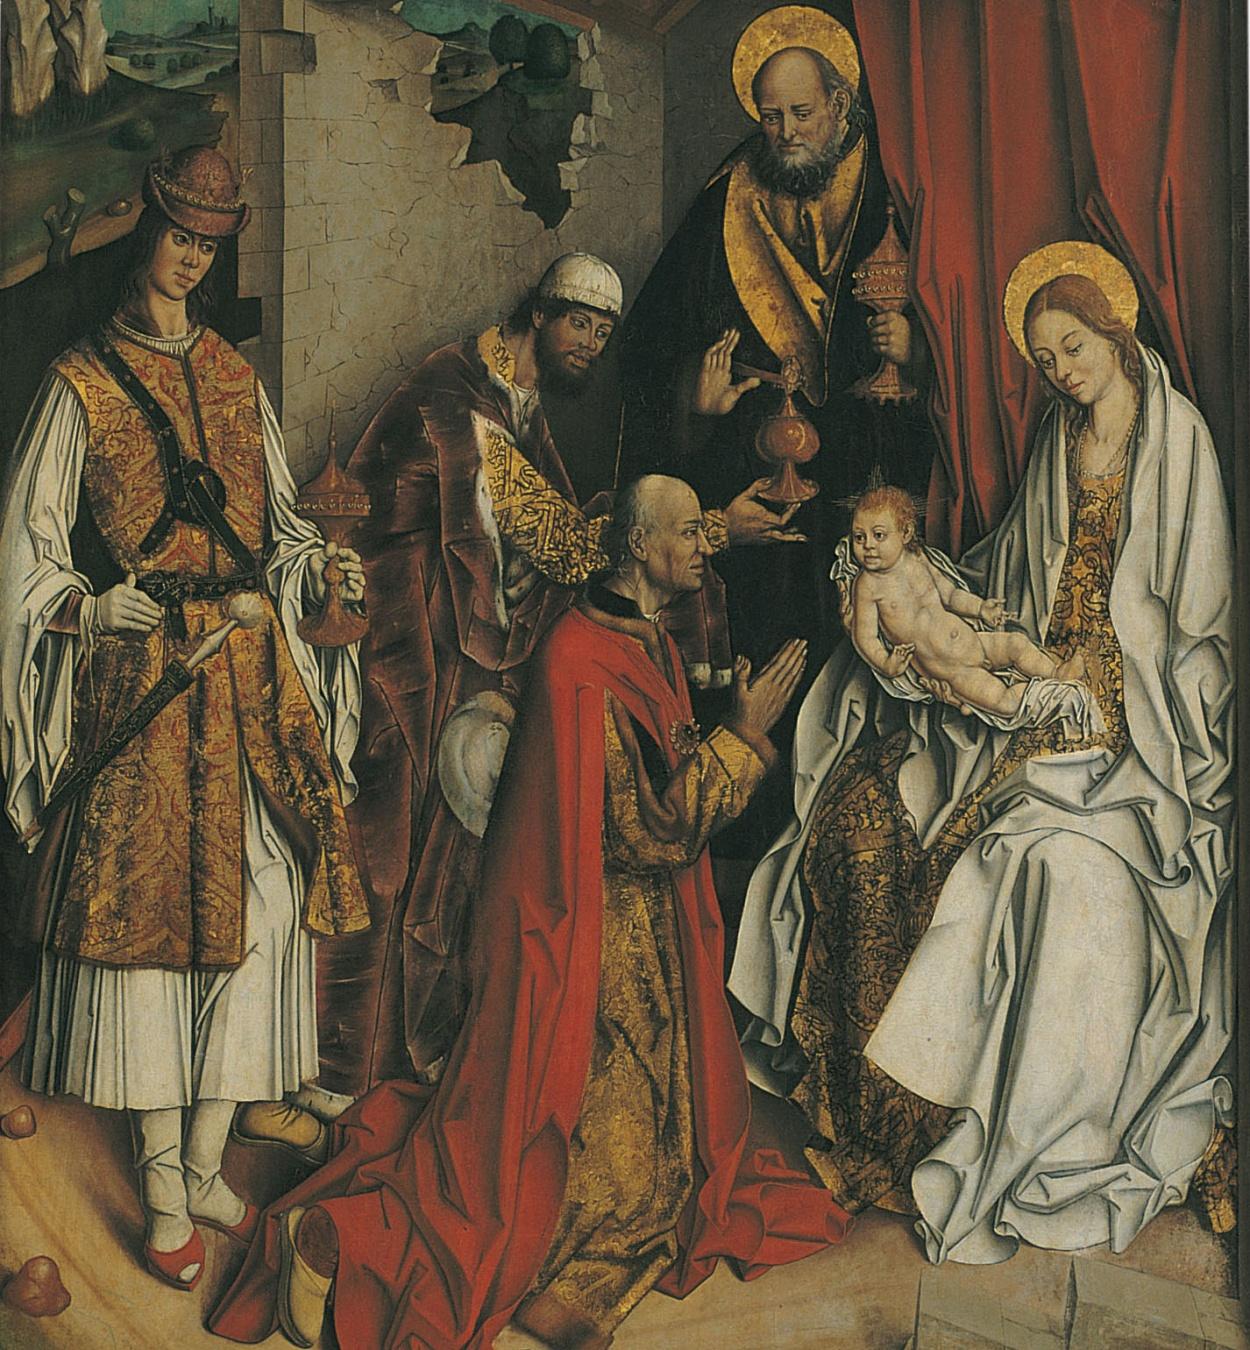 Fernando Gallego - Epifania - Cap a 1480-1490